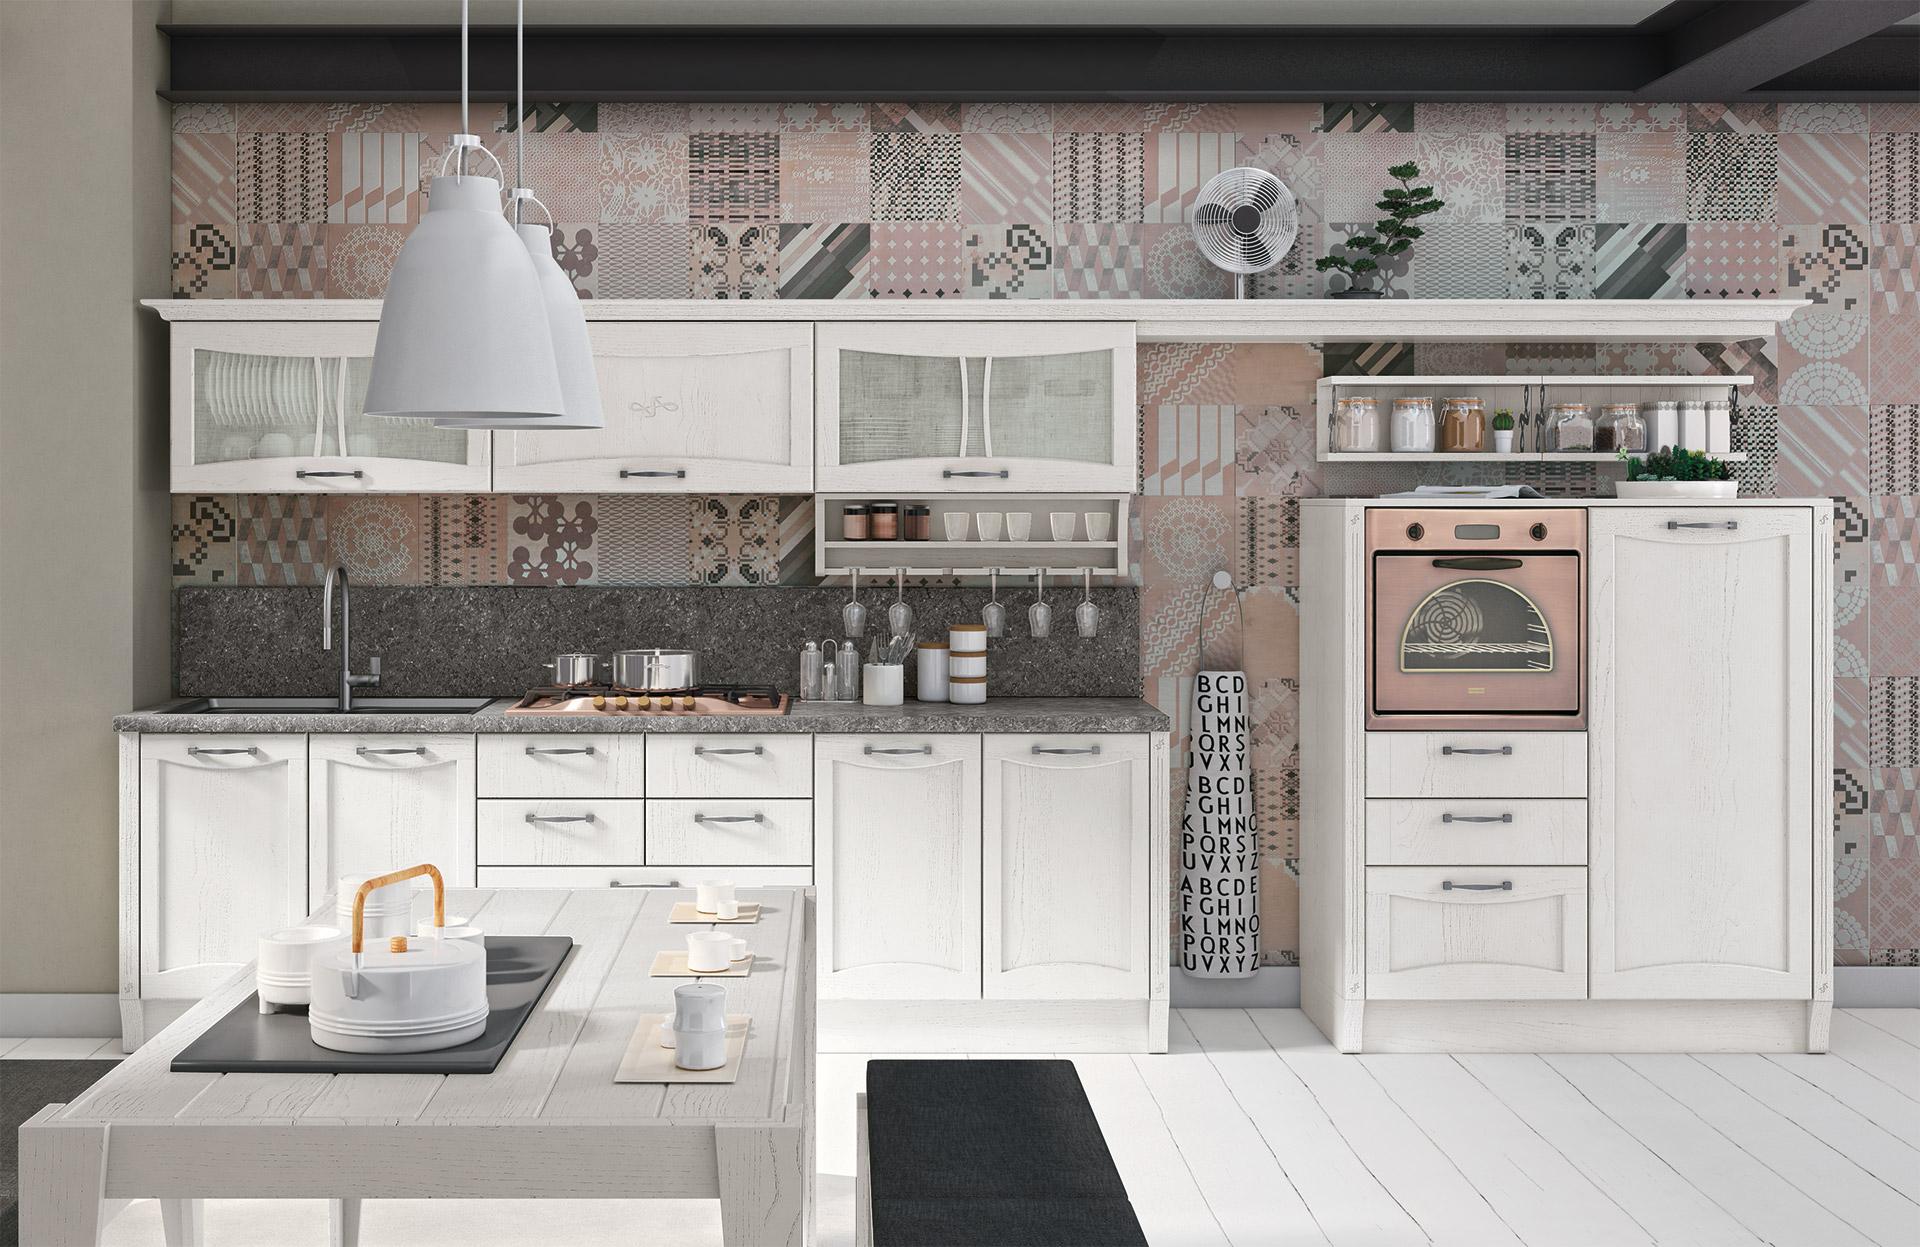 cucine in marmo Archivi - Creo Store Milano - Showroom ...